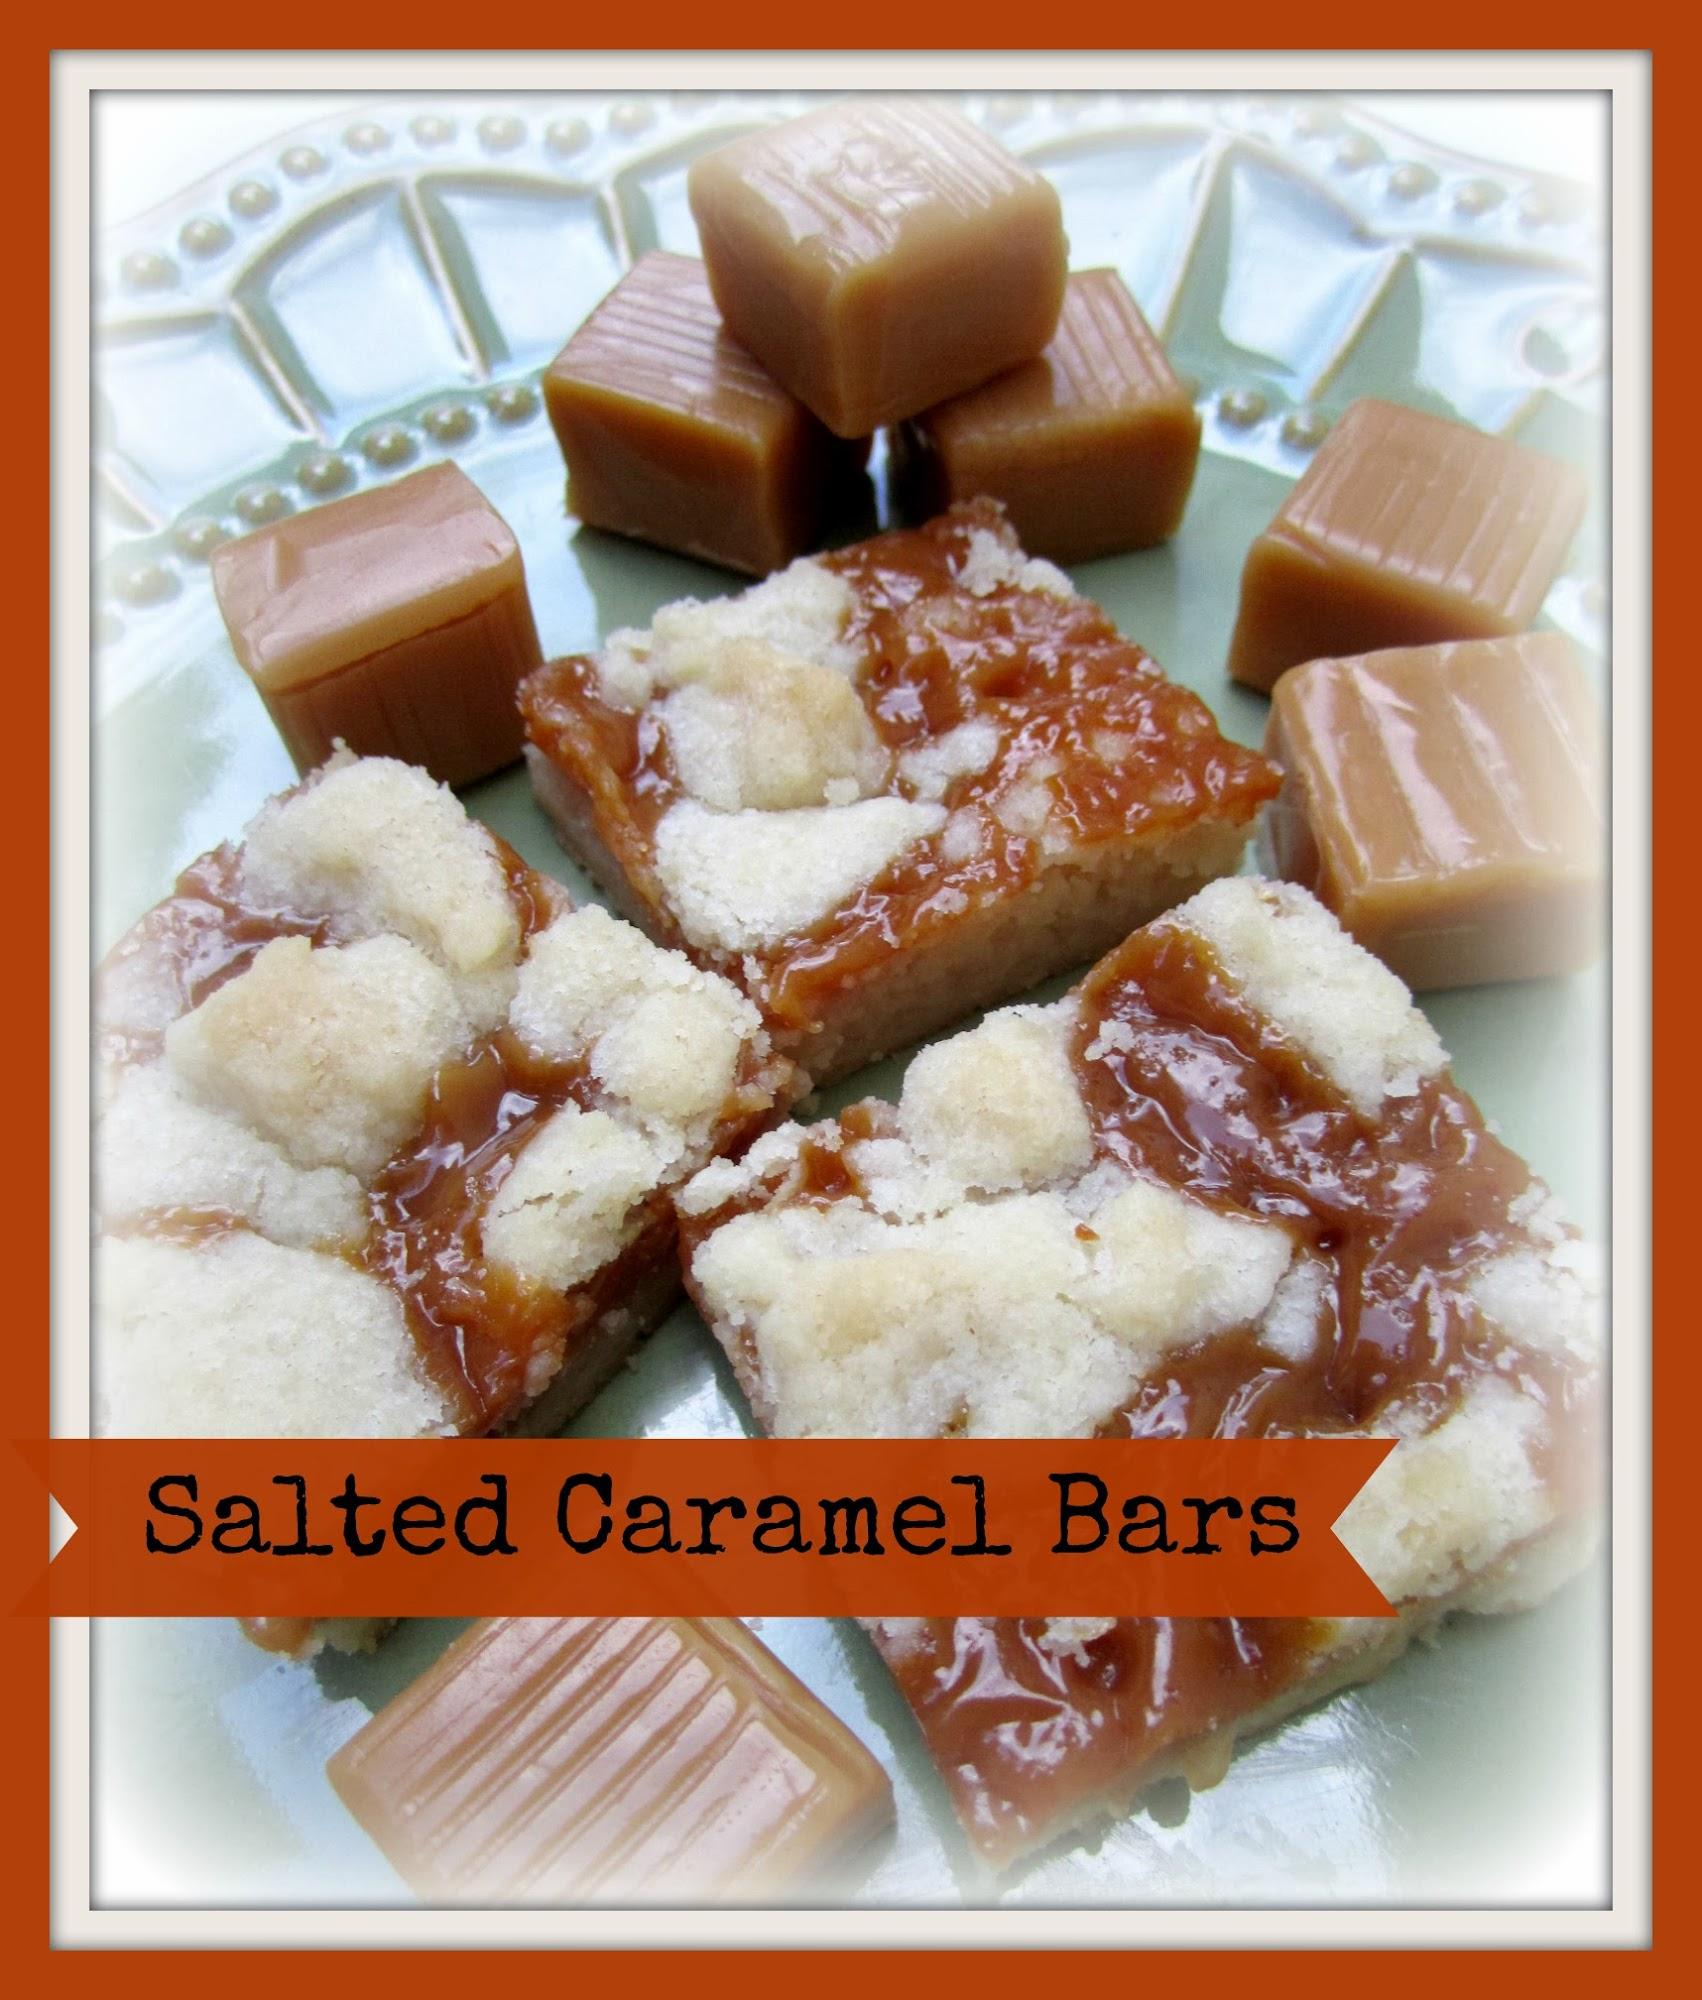 Salted Caramel Bars Recipe